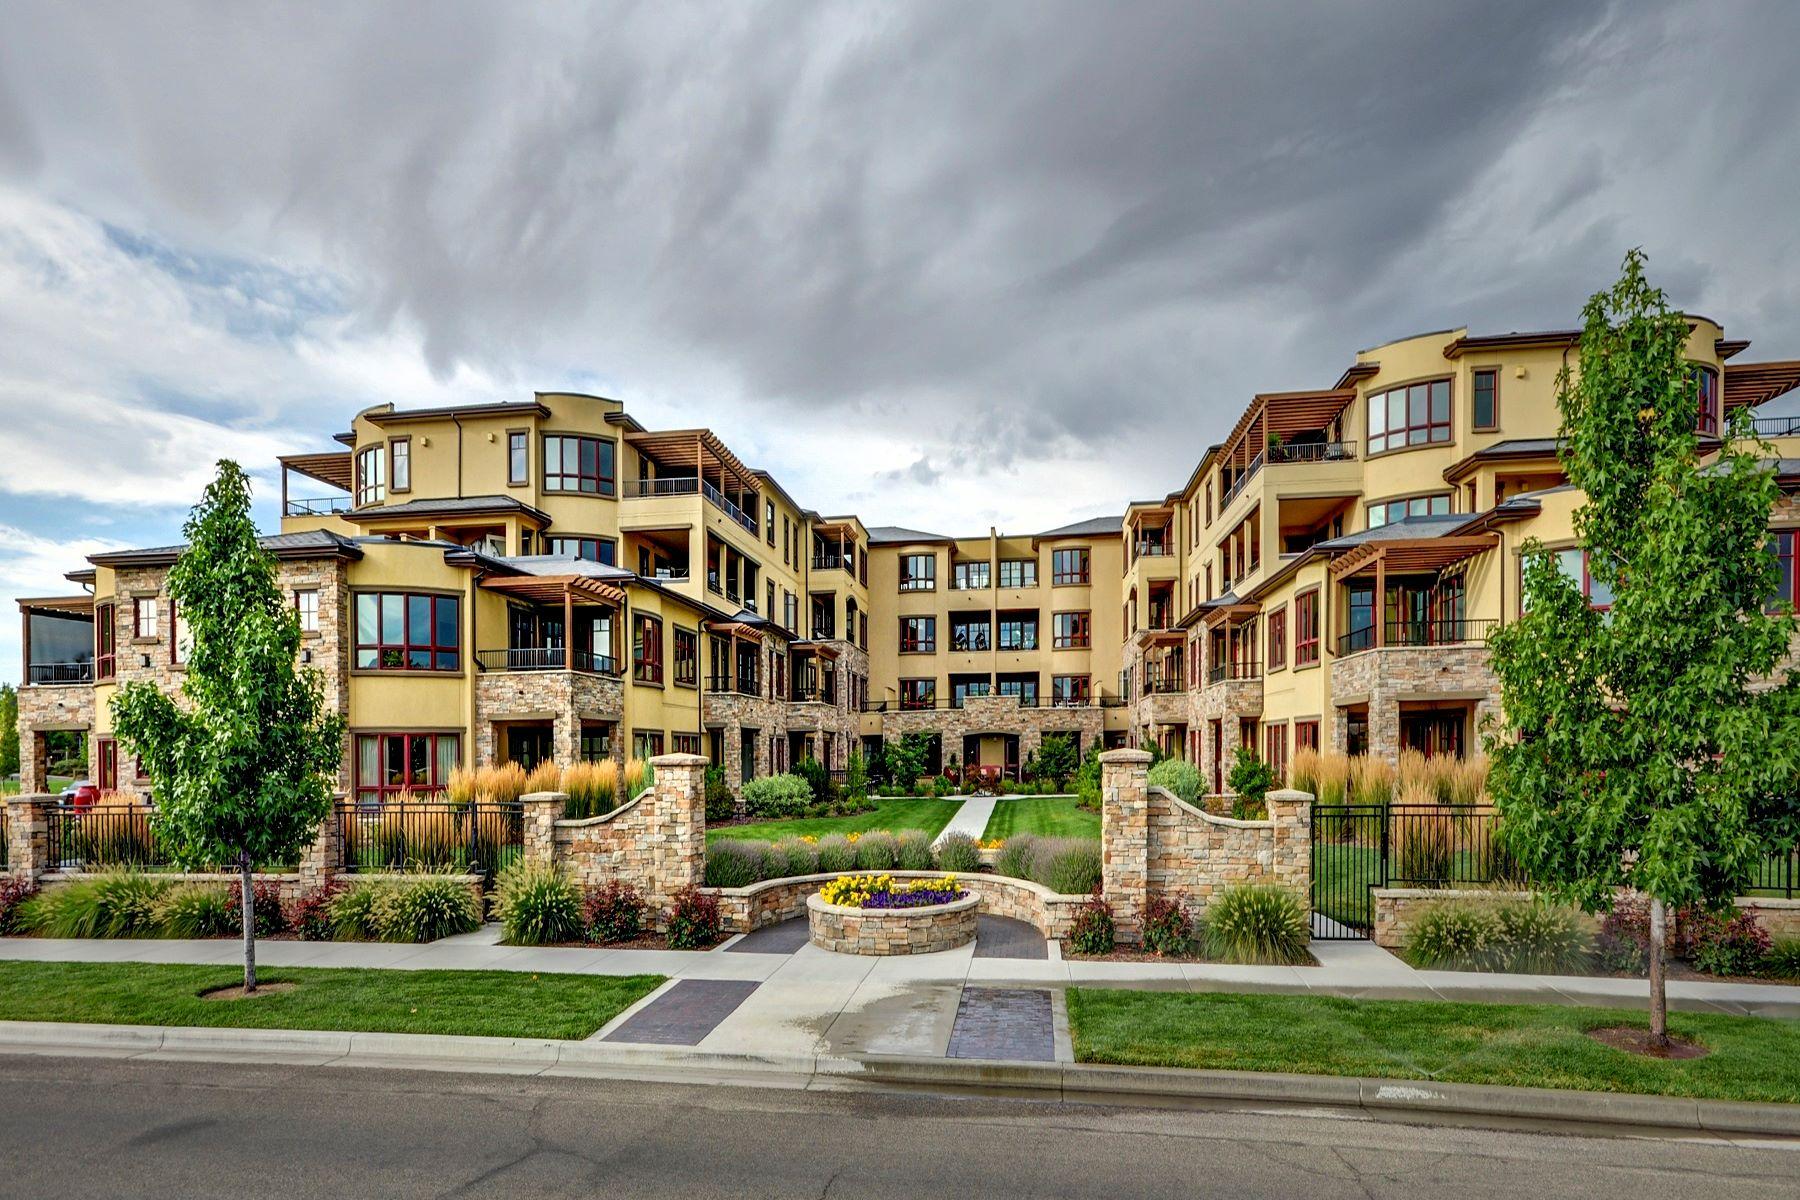 Condominiums for Sale at 3075 Crescent Rim Dr #102 102, Boise 3075 W Crescent Rim Dr #102 102 Boise, Idaho 83706 United States